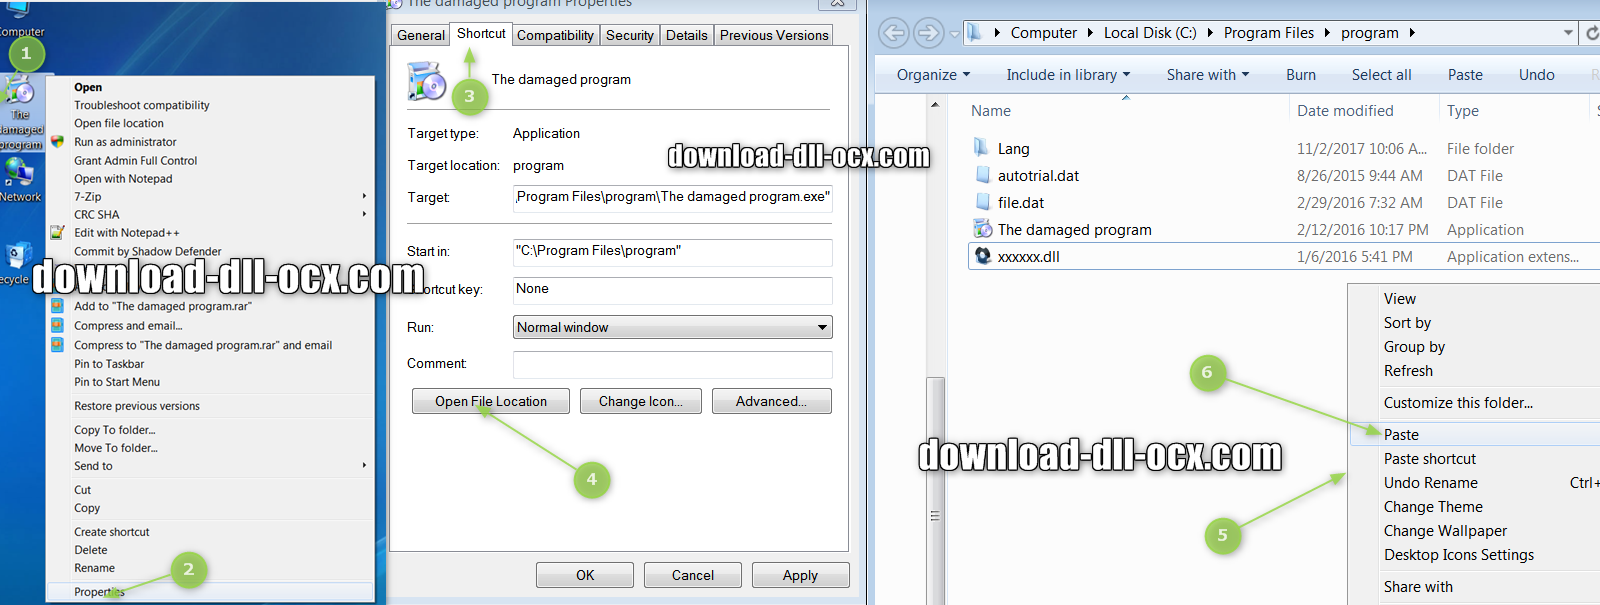 how to install jgapgen.dll file? for fix missing